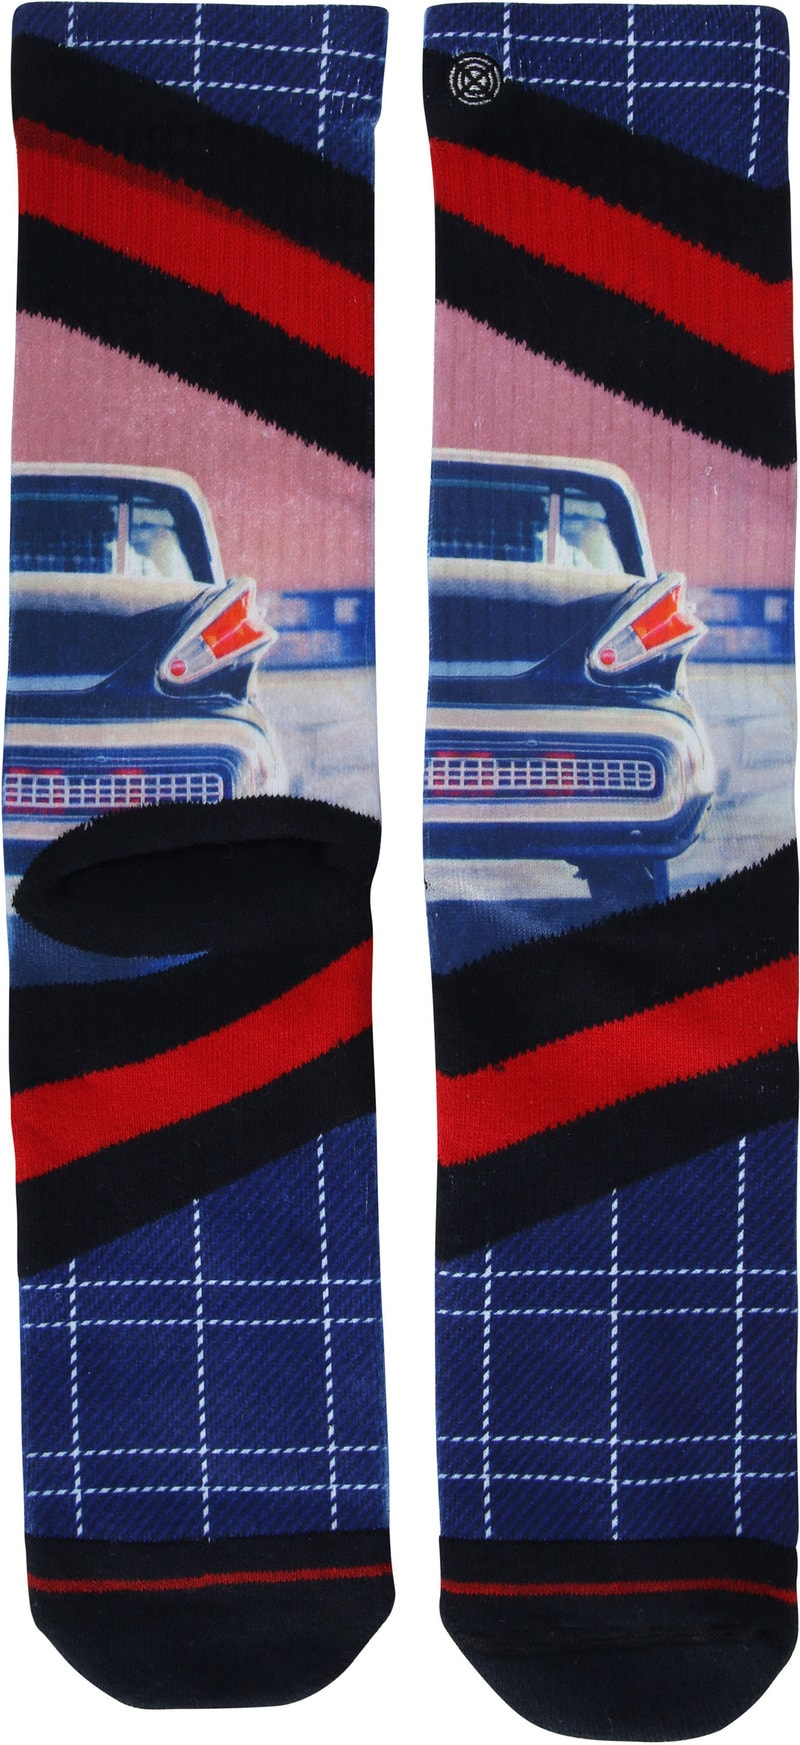 Xpooos Socken Chrome Foto 1